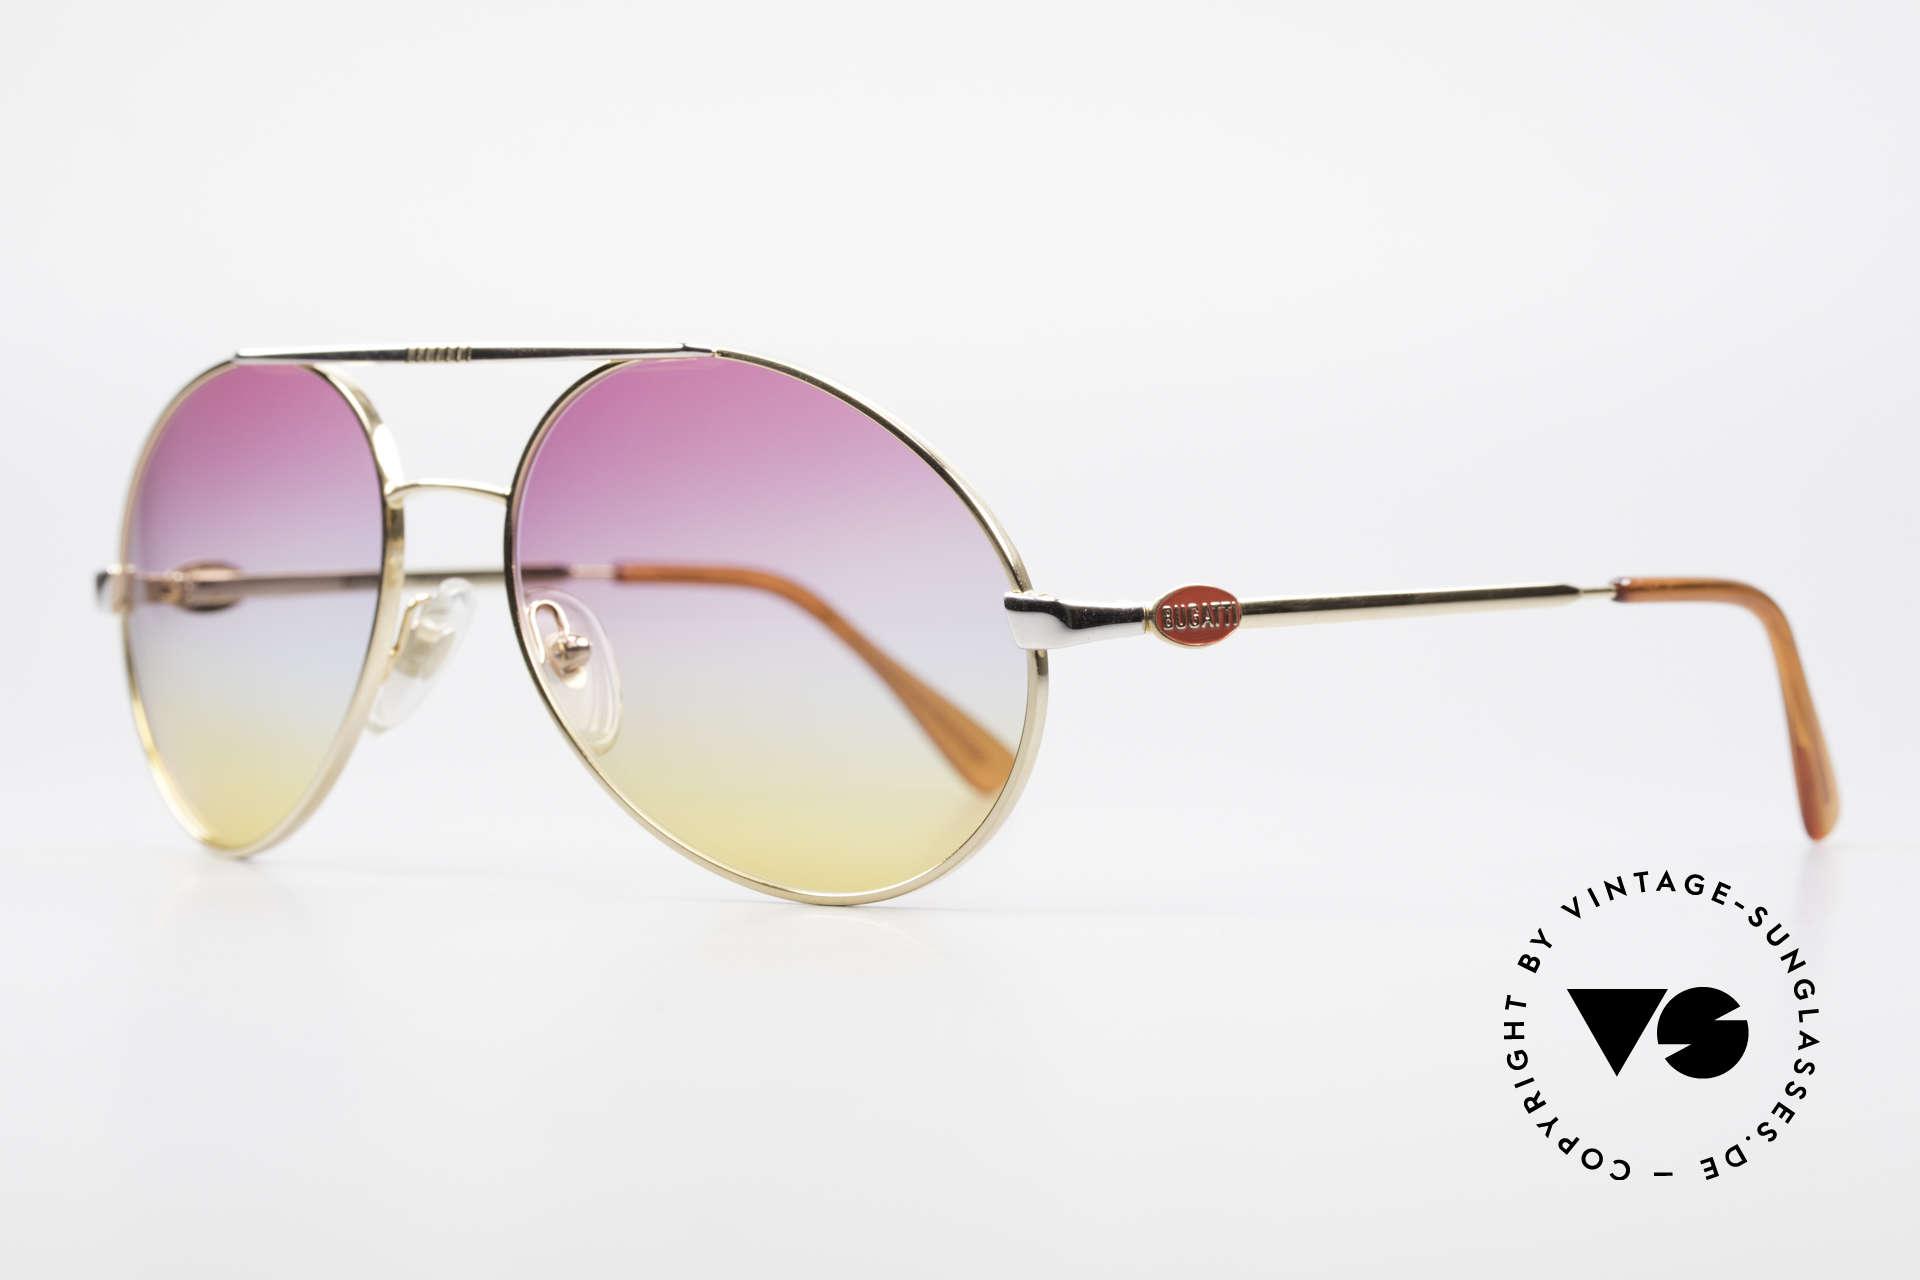 Bugatti 64320 Rare 80's Sunglasses Vintage, terrific combination of frame and sun lenses, Made for Men